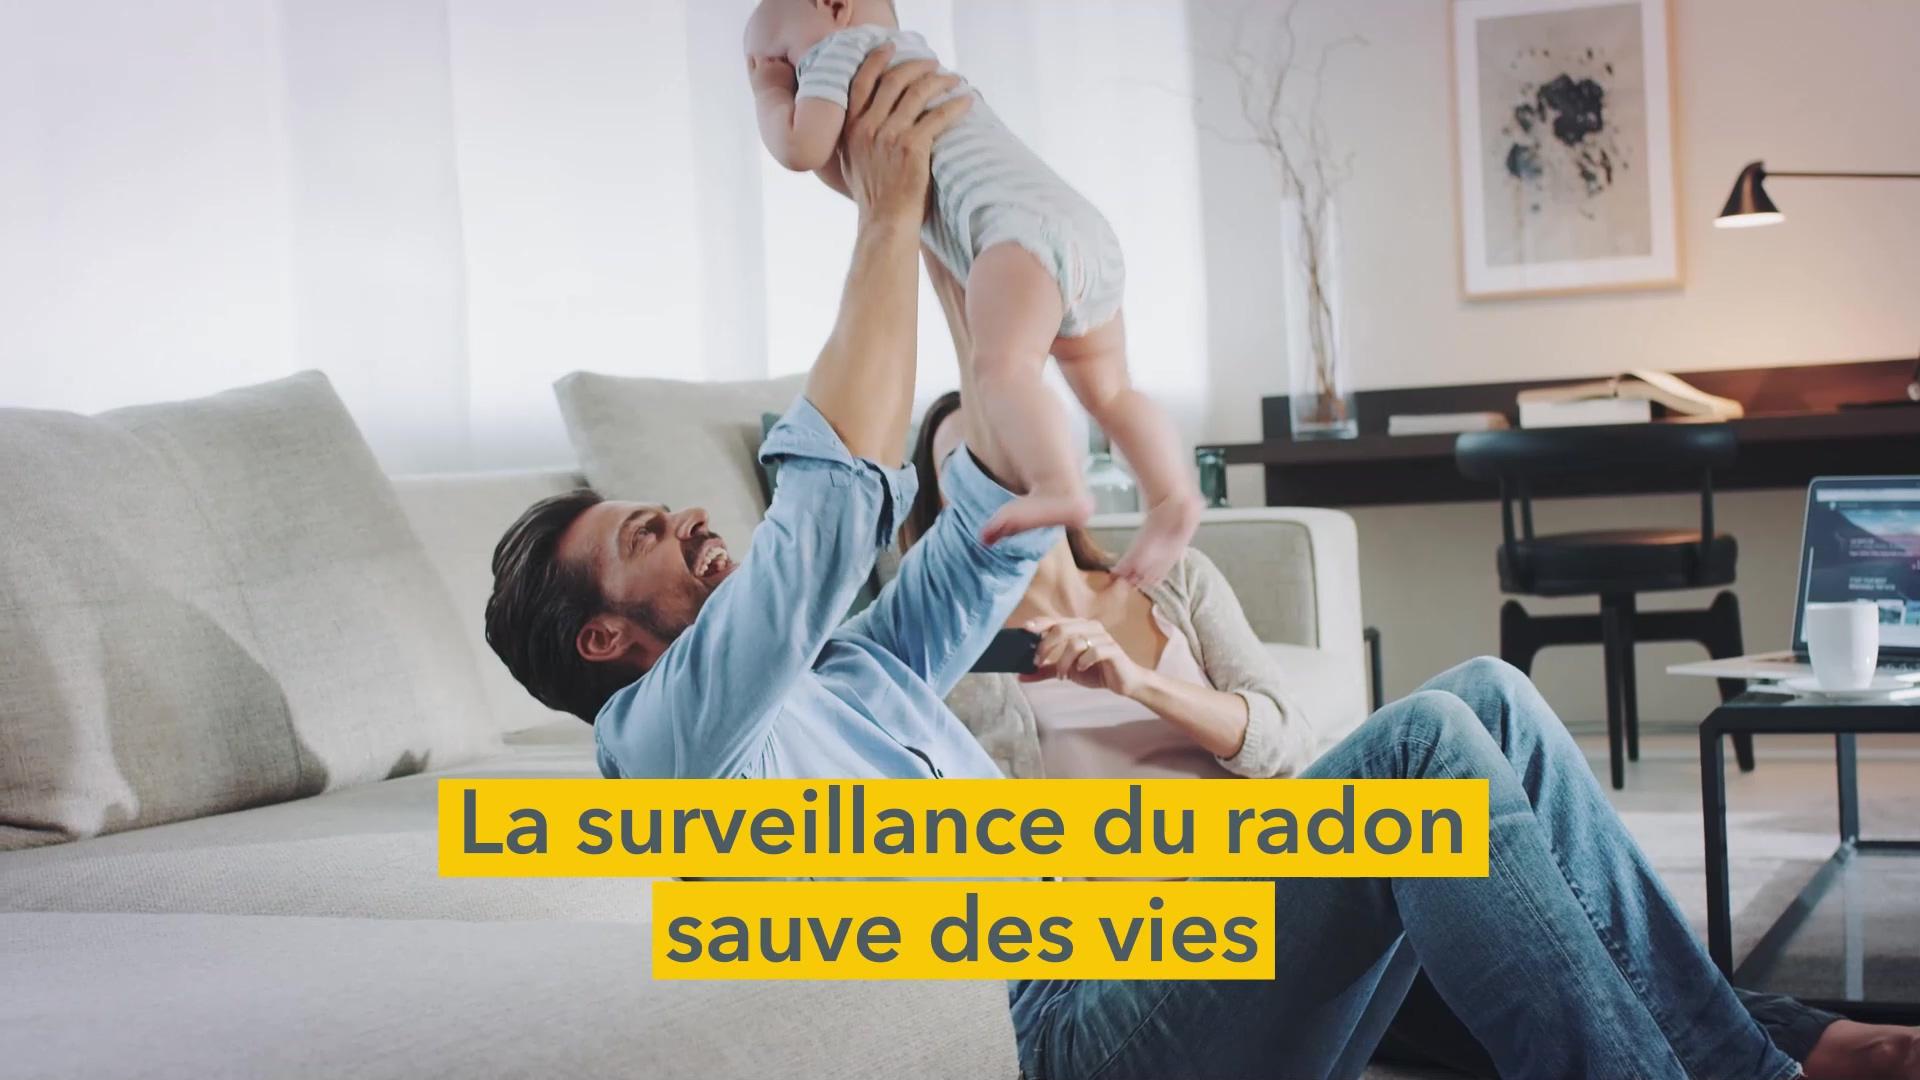 airthings-radon-campaign-30s-FR-CA-052021